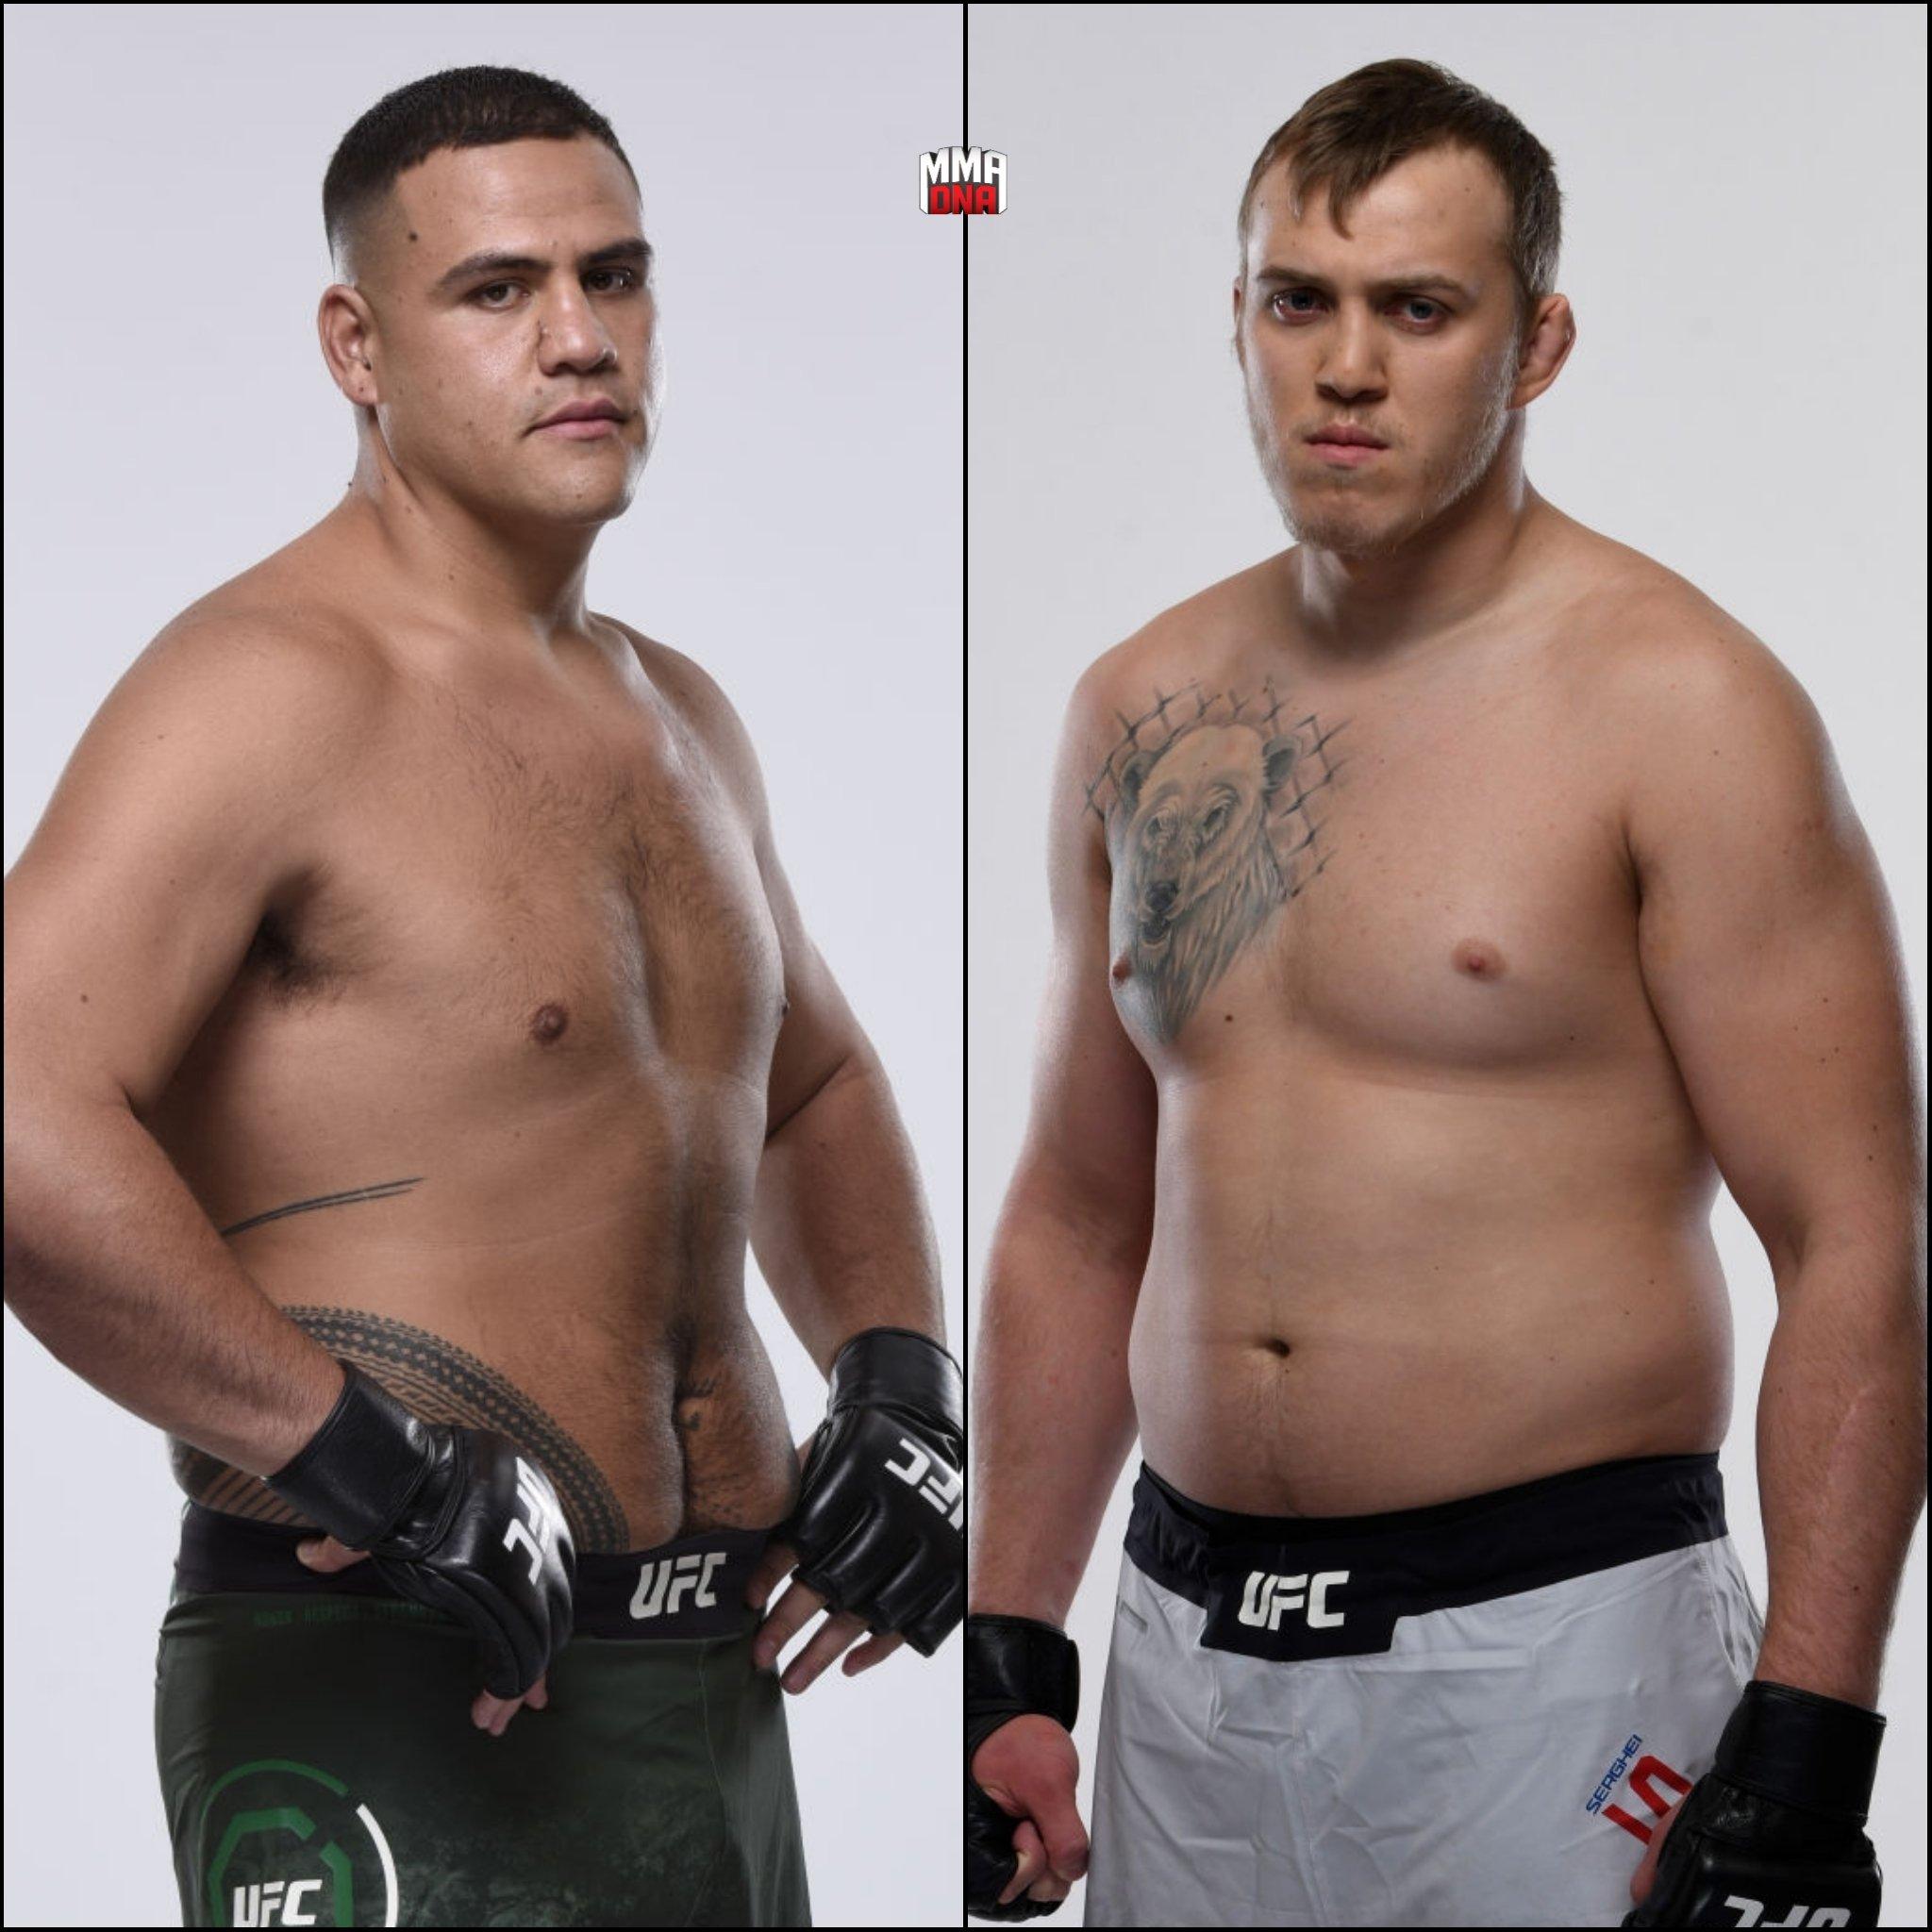 Tai Tuivasa will fight Sergey Spivak at #UFC243 in Melbourne, Victoria, Australia. (Oct. 5, 2019). #UFC #MMA #UFCMelbourne https://t.co/5YzMyCFOi5